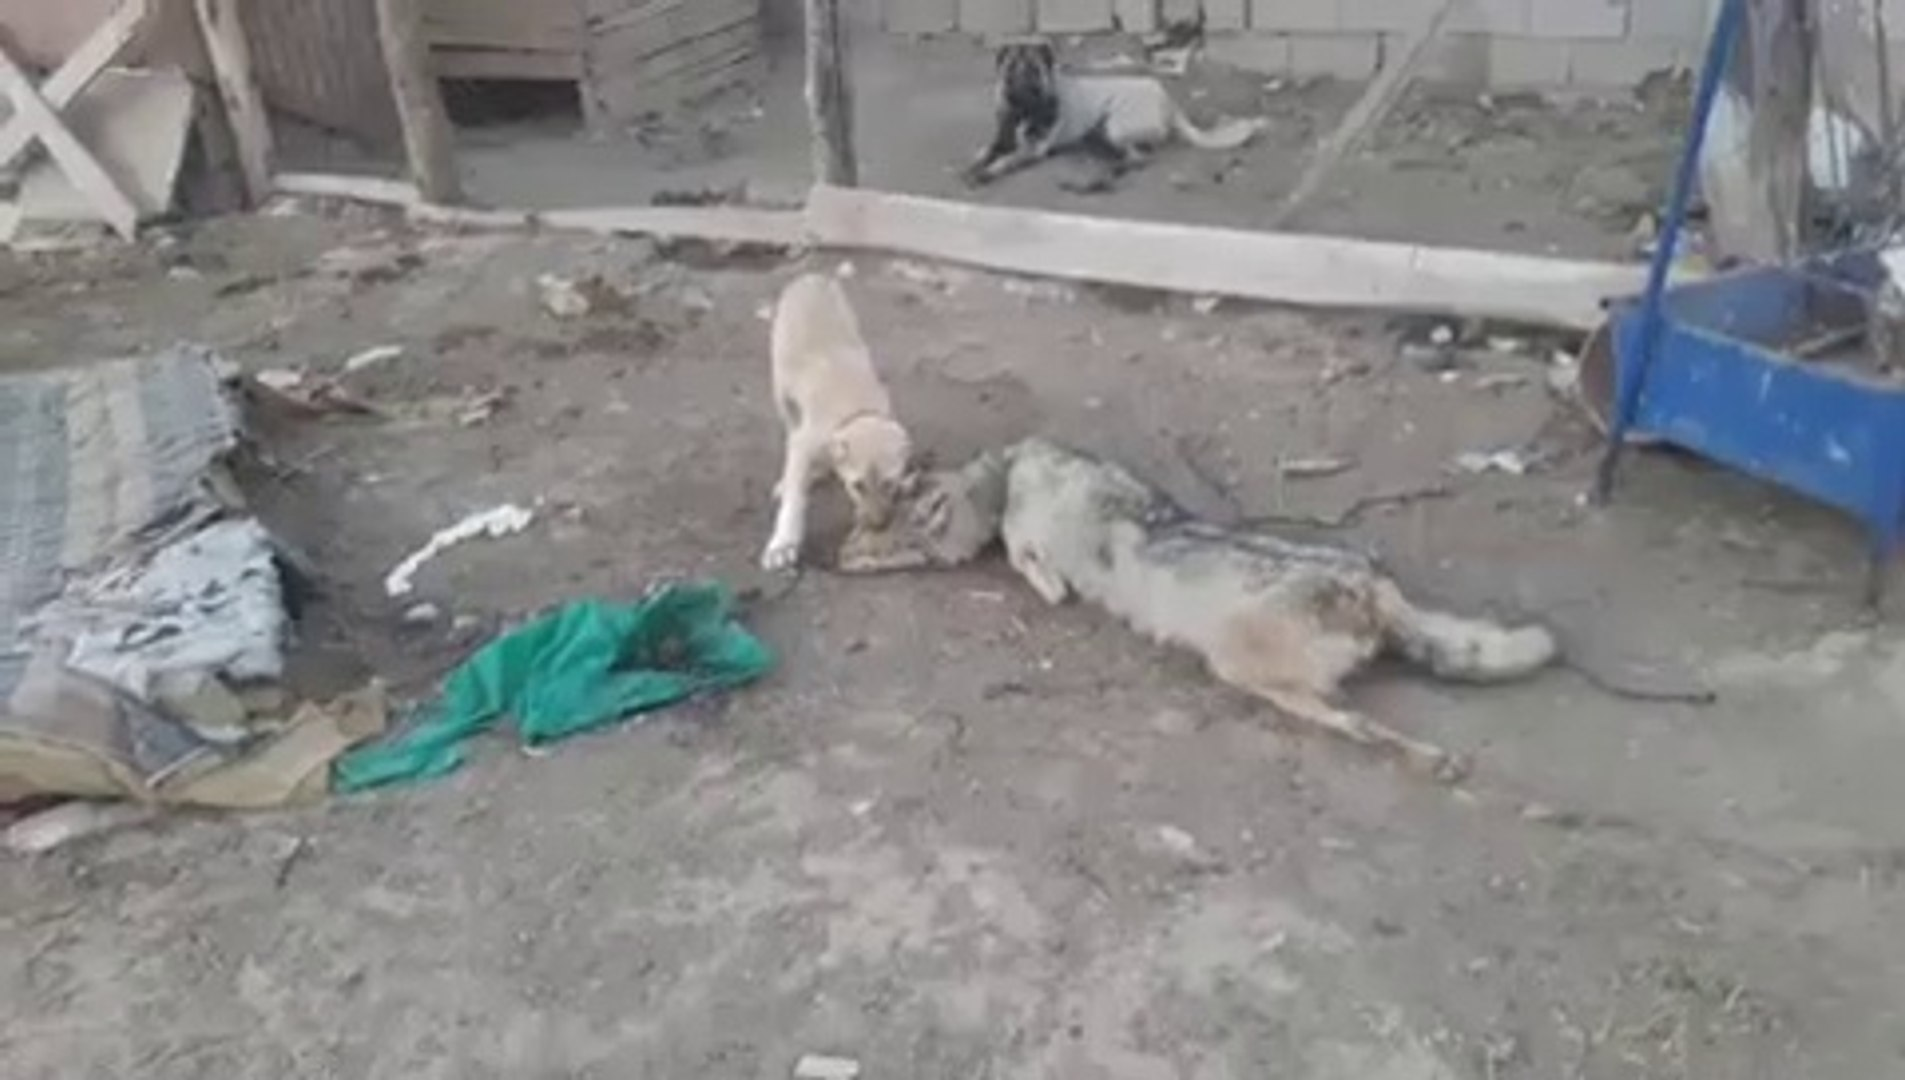 ANADOLU COBAN KOPEK YAVRUSUNA KURT POSTU iLE EGiTiM - ANATOLiAN SHEPHERD DOG PUPPY and WOLF